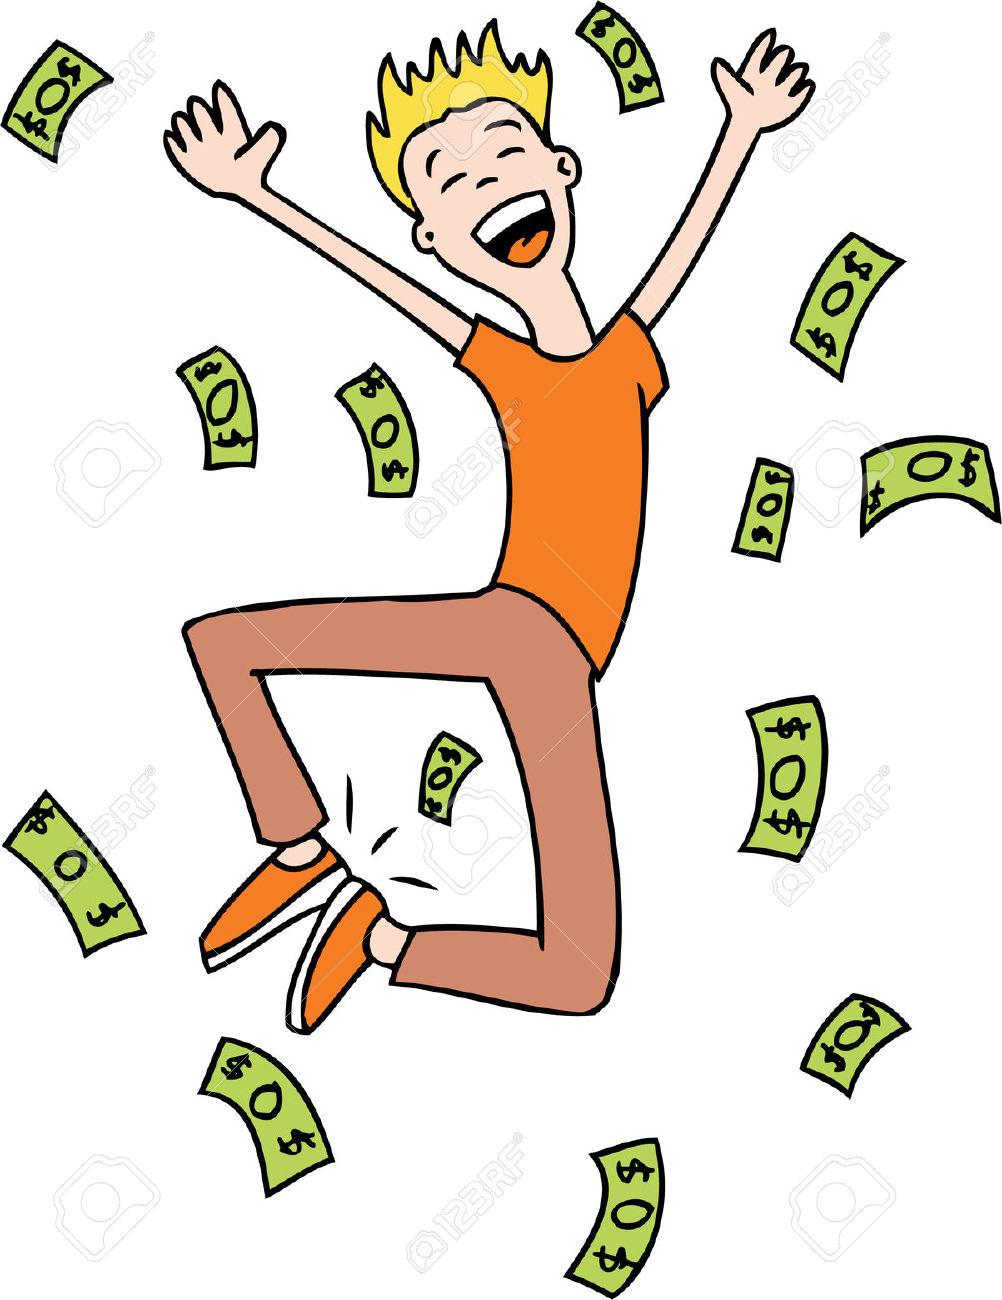 361 Raining Money Stock Vector Illustration And Royalty Free.